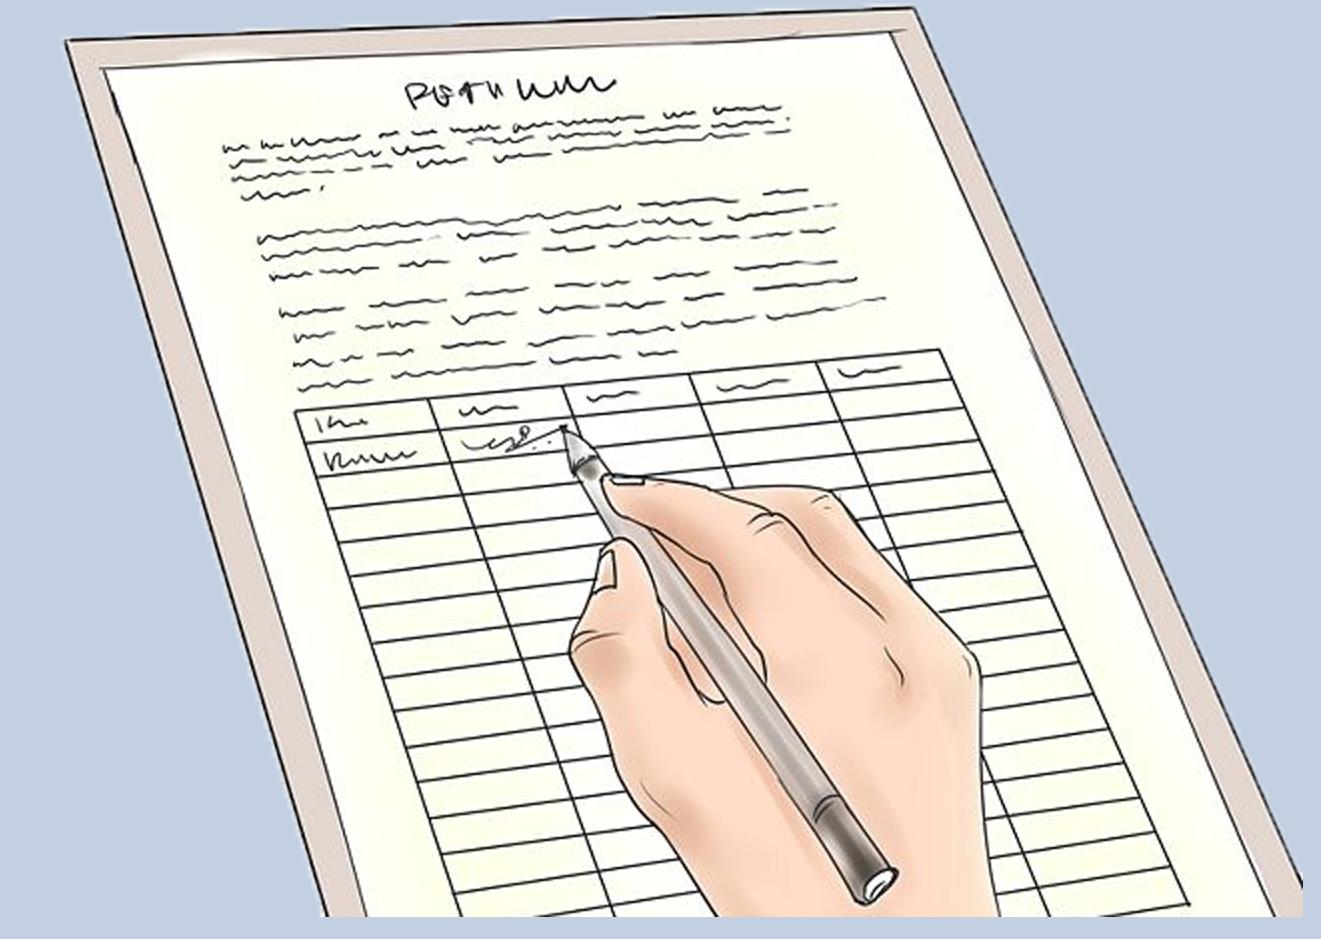 Petition-3-copy.jpg